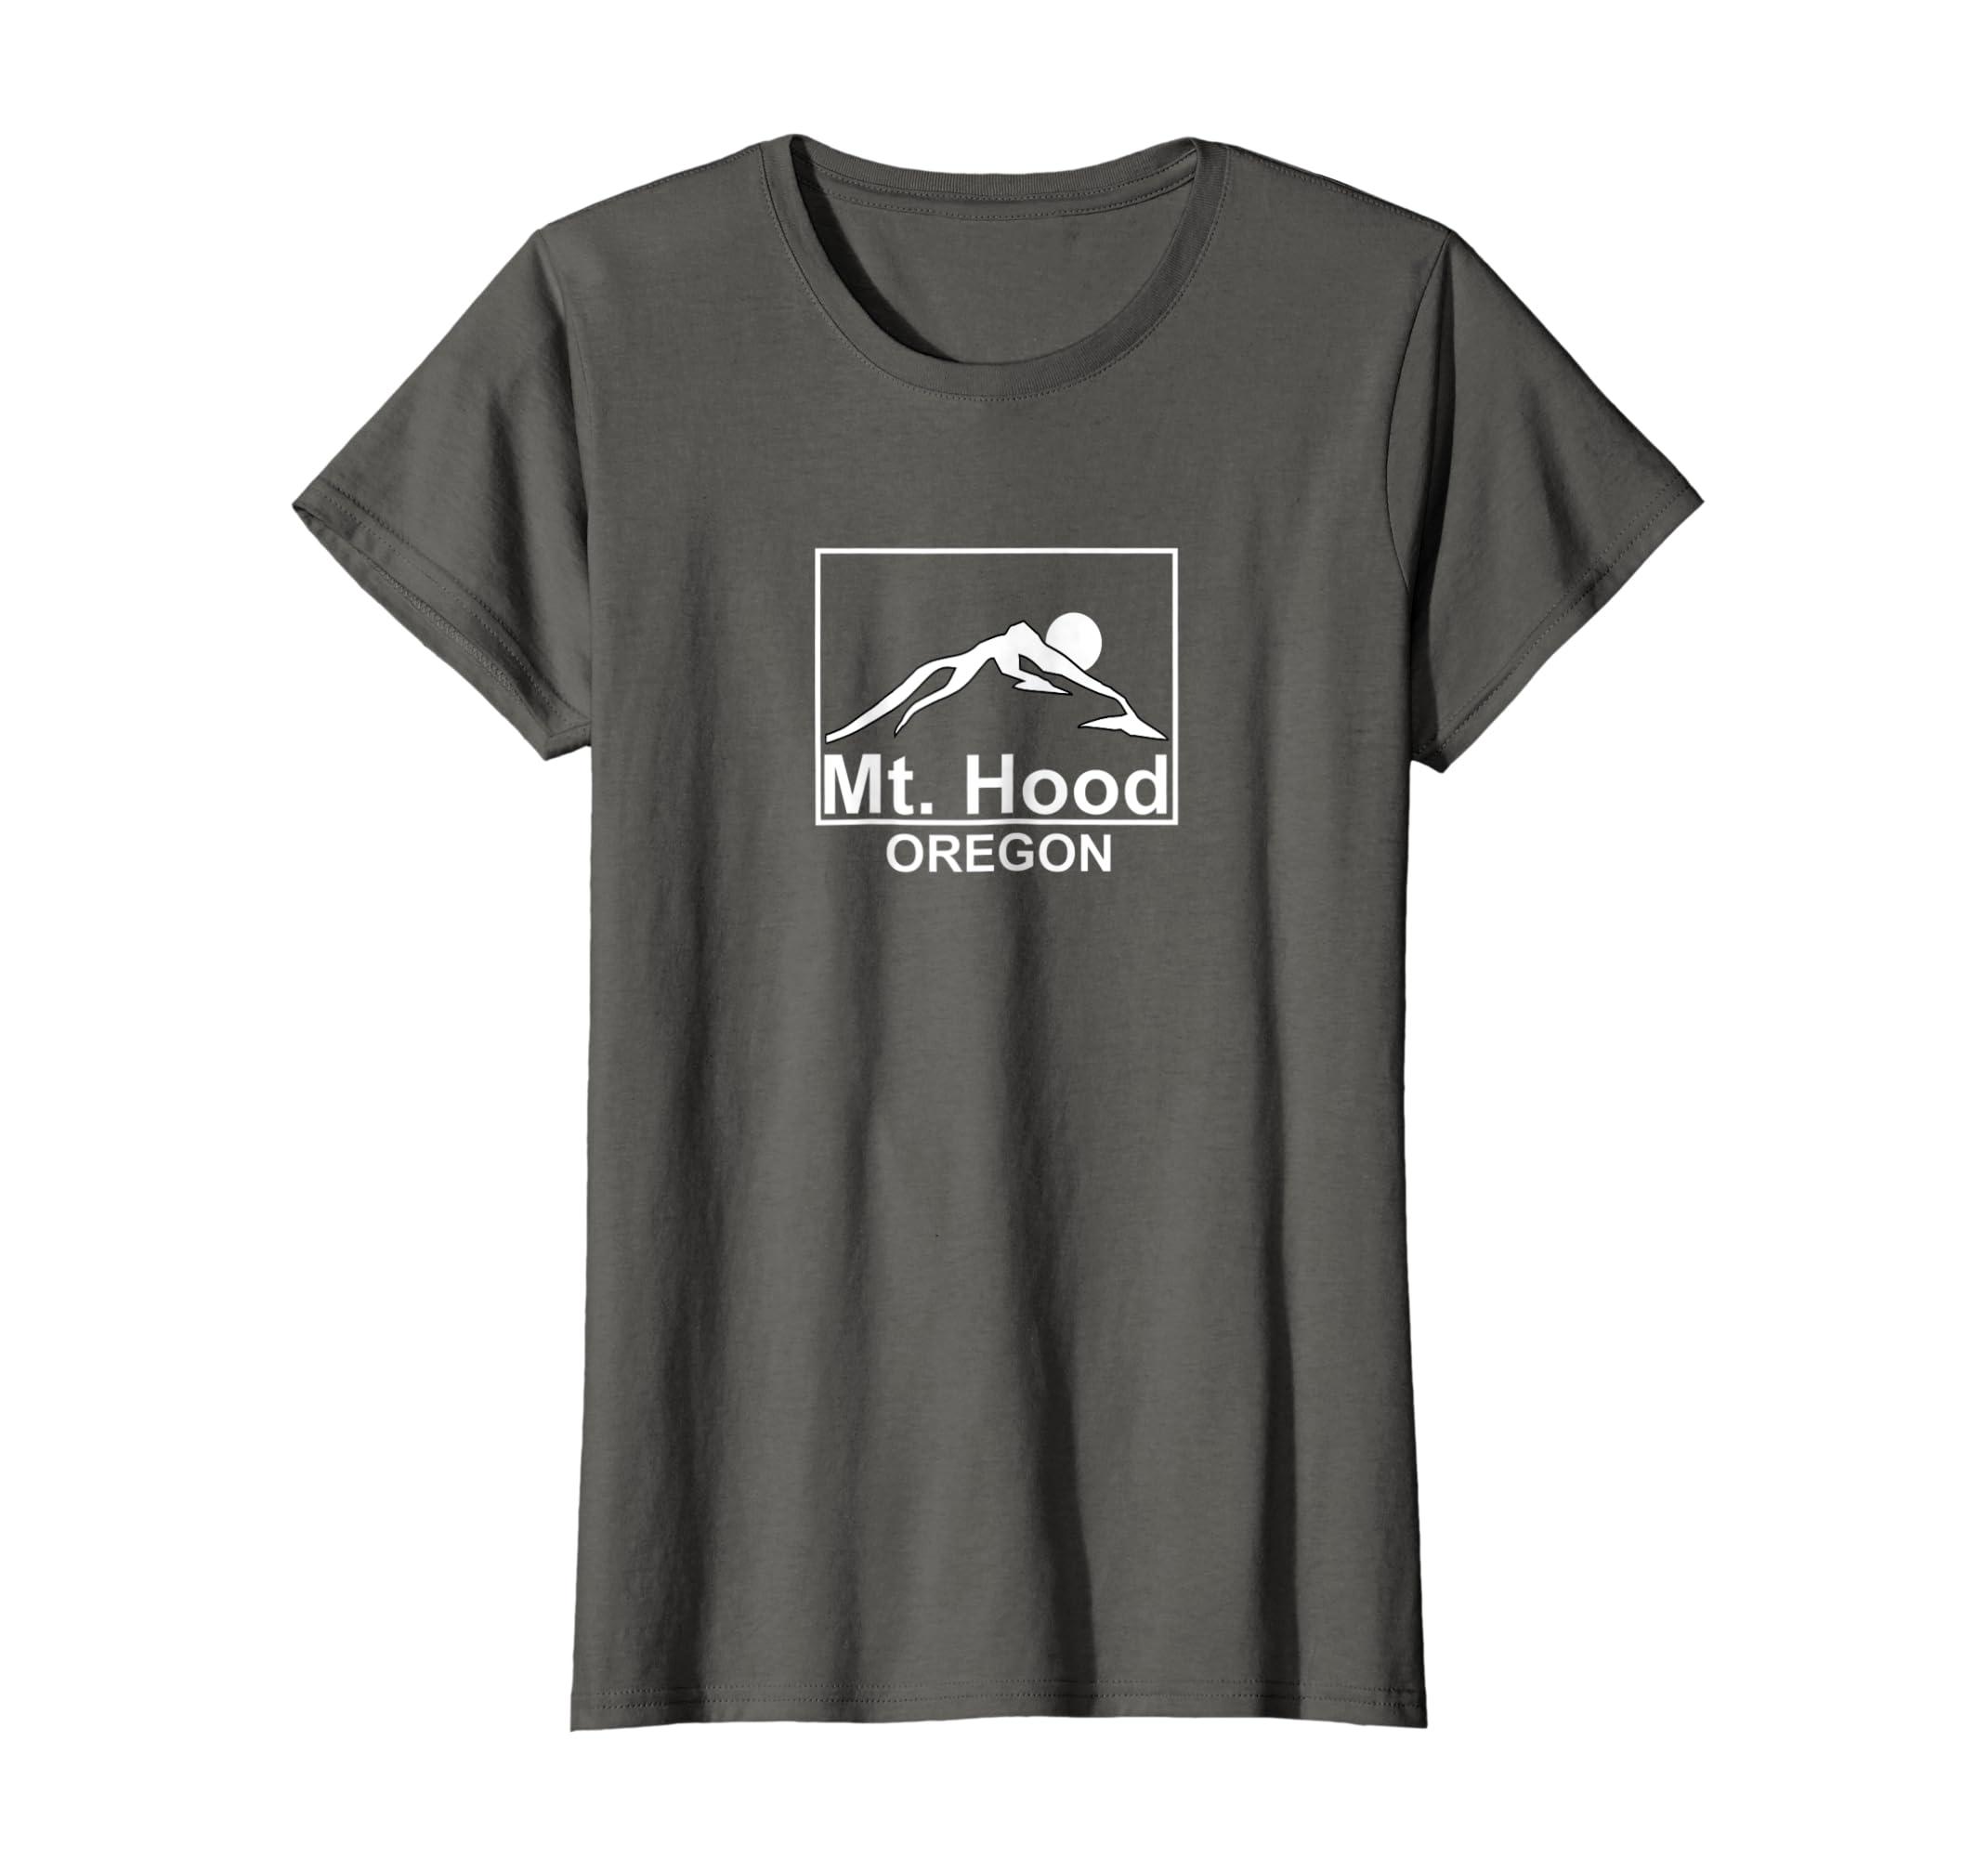 66adbde5ef0 Amazon.com  Mt Hood Oregon Mountain T-shirt  Clothing